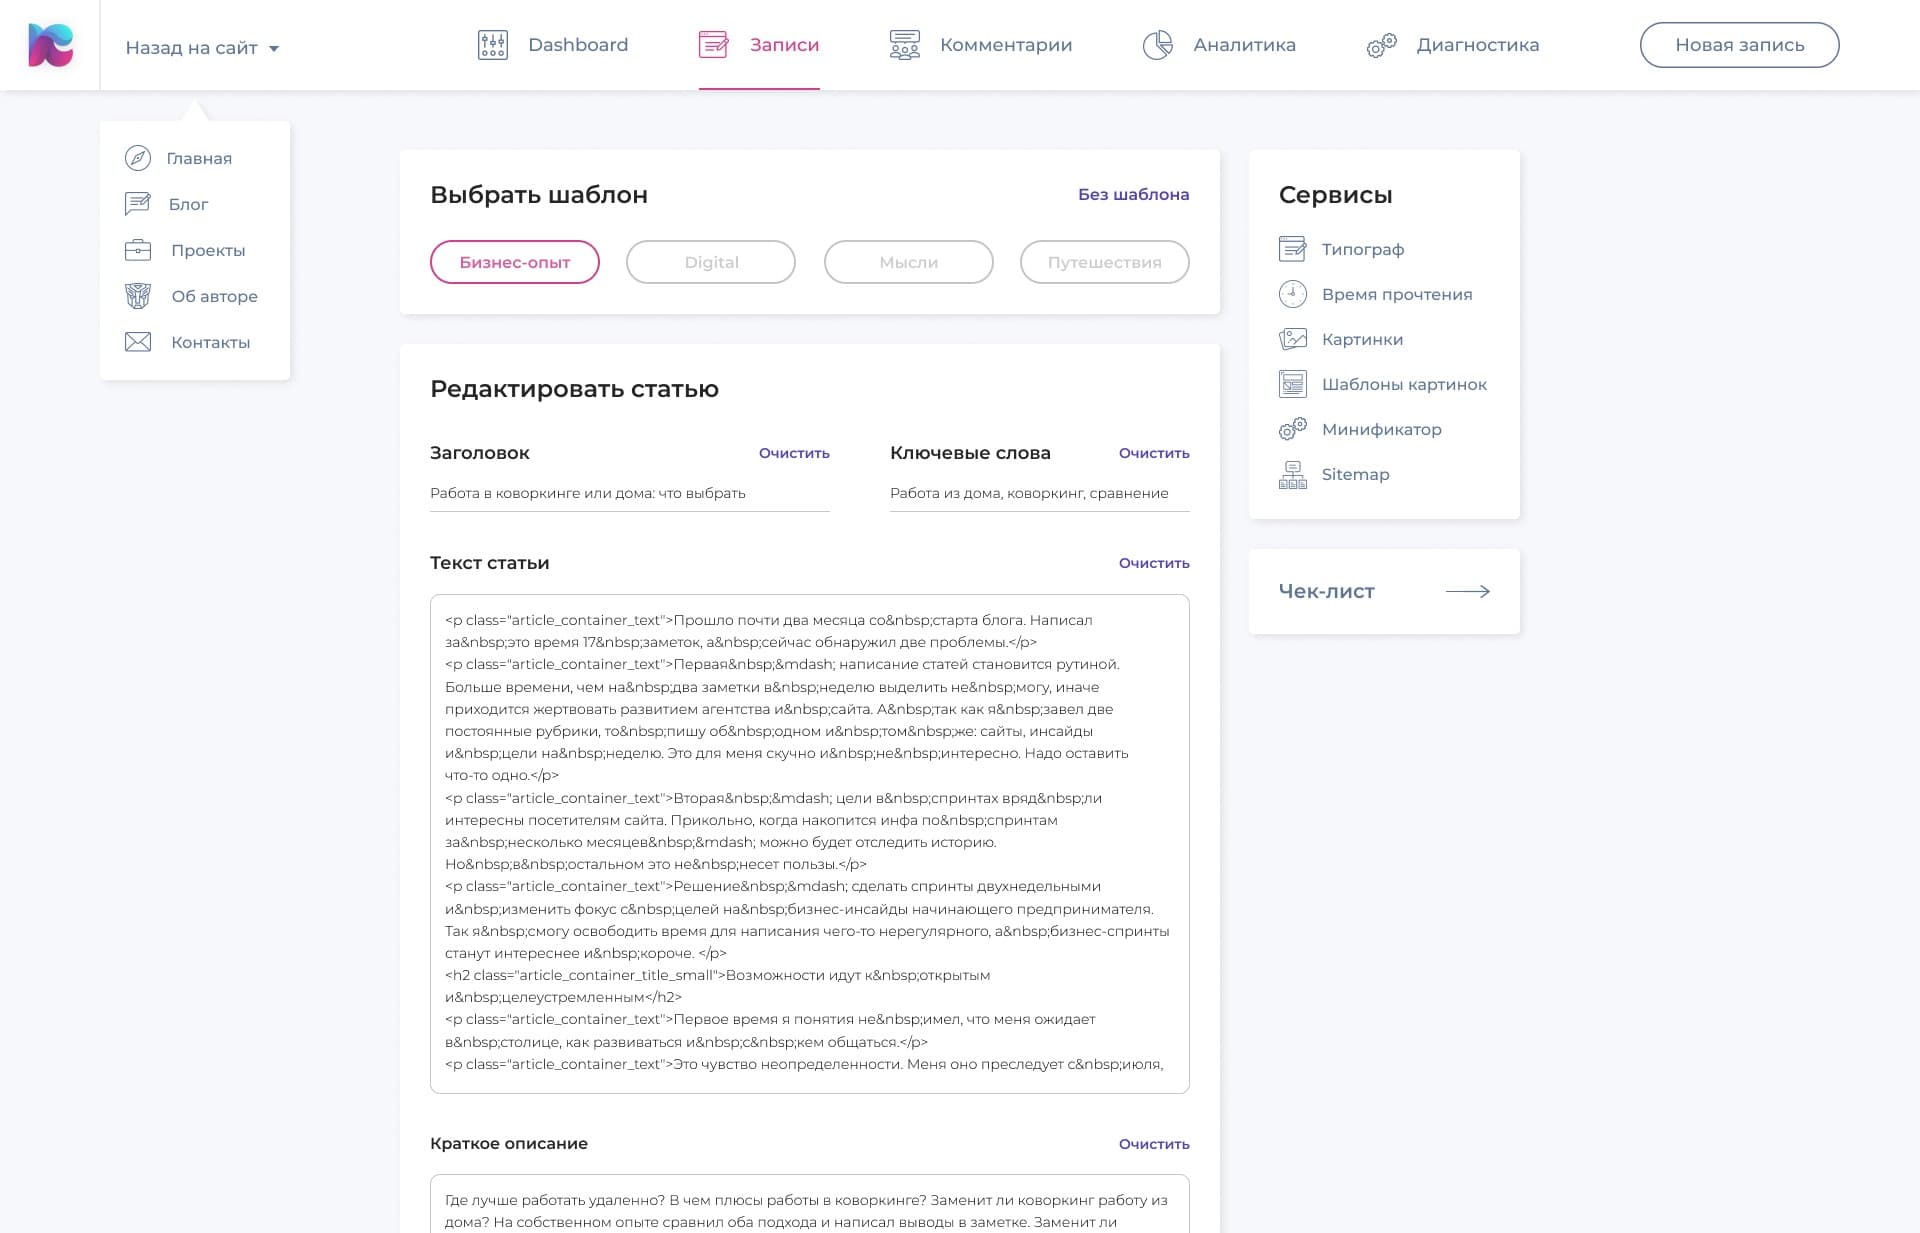 макет панели управления сайта khorin.ru